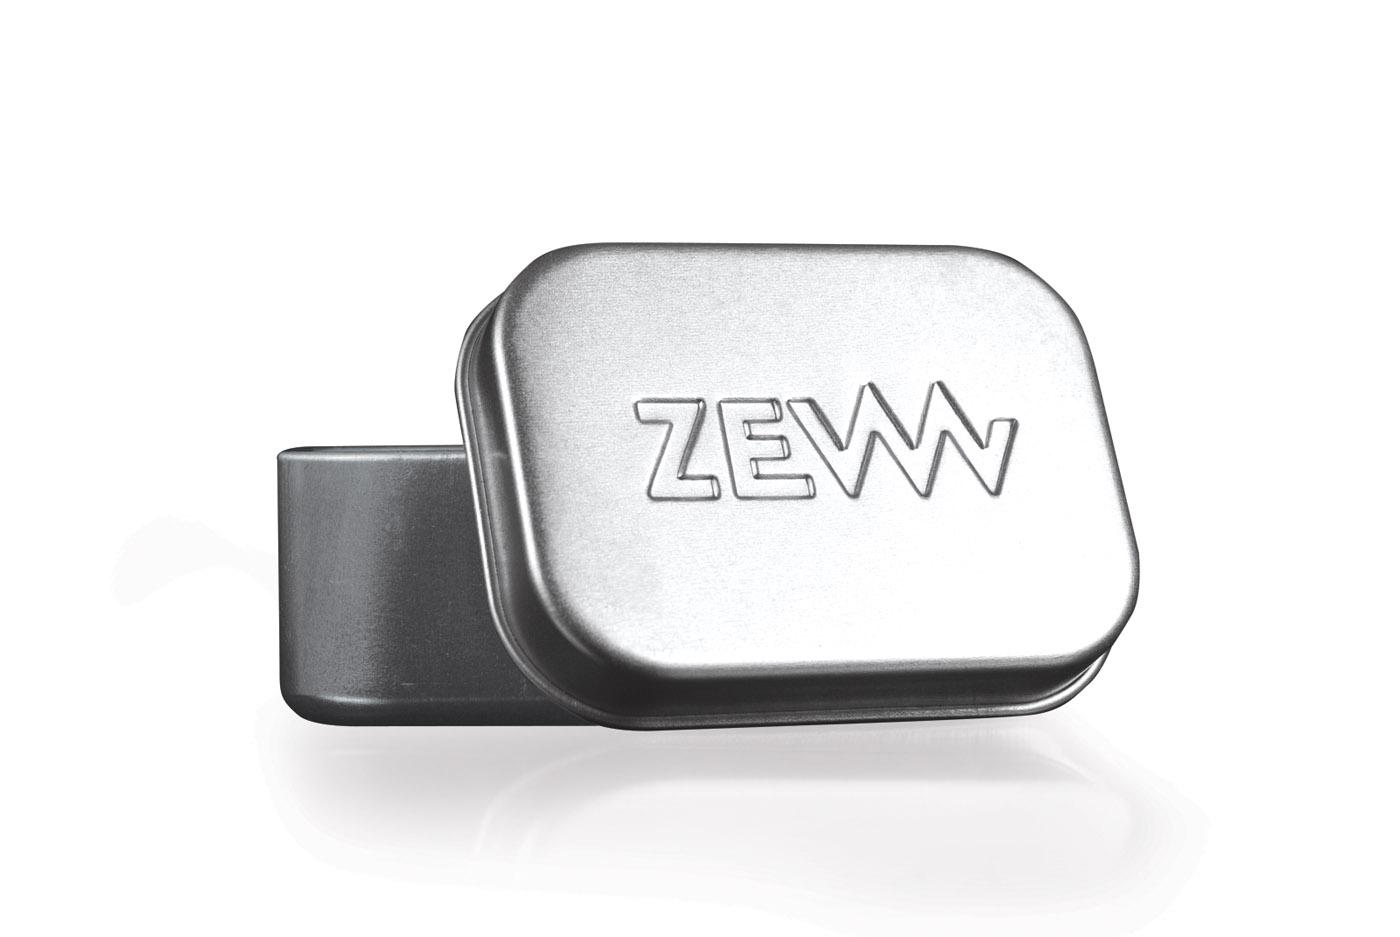 ZEW for men Soap dish - púzdro na mydlo